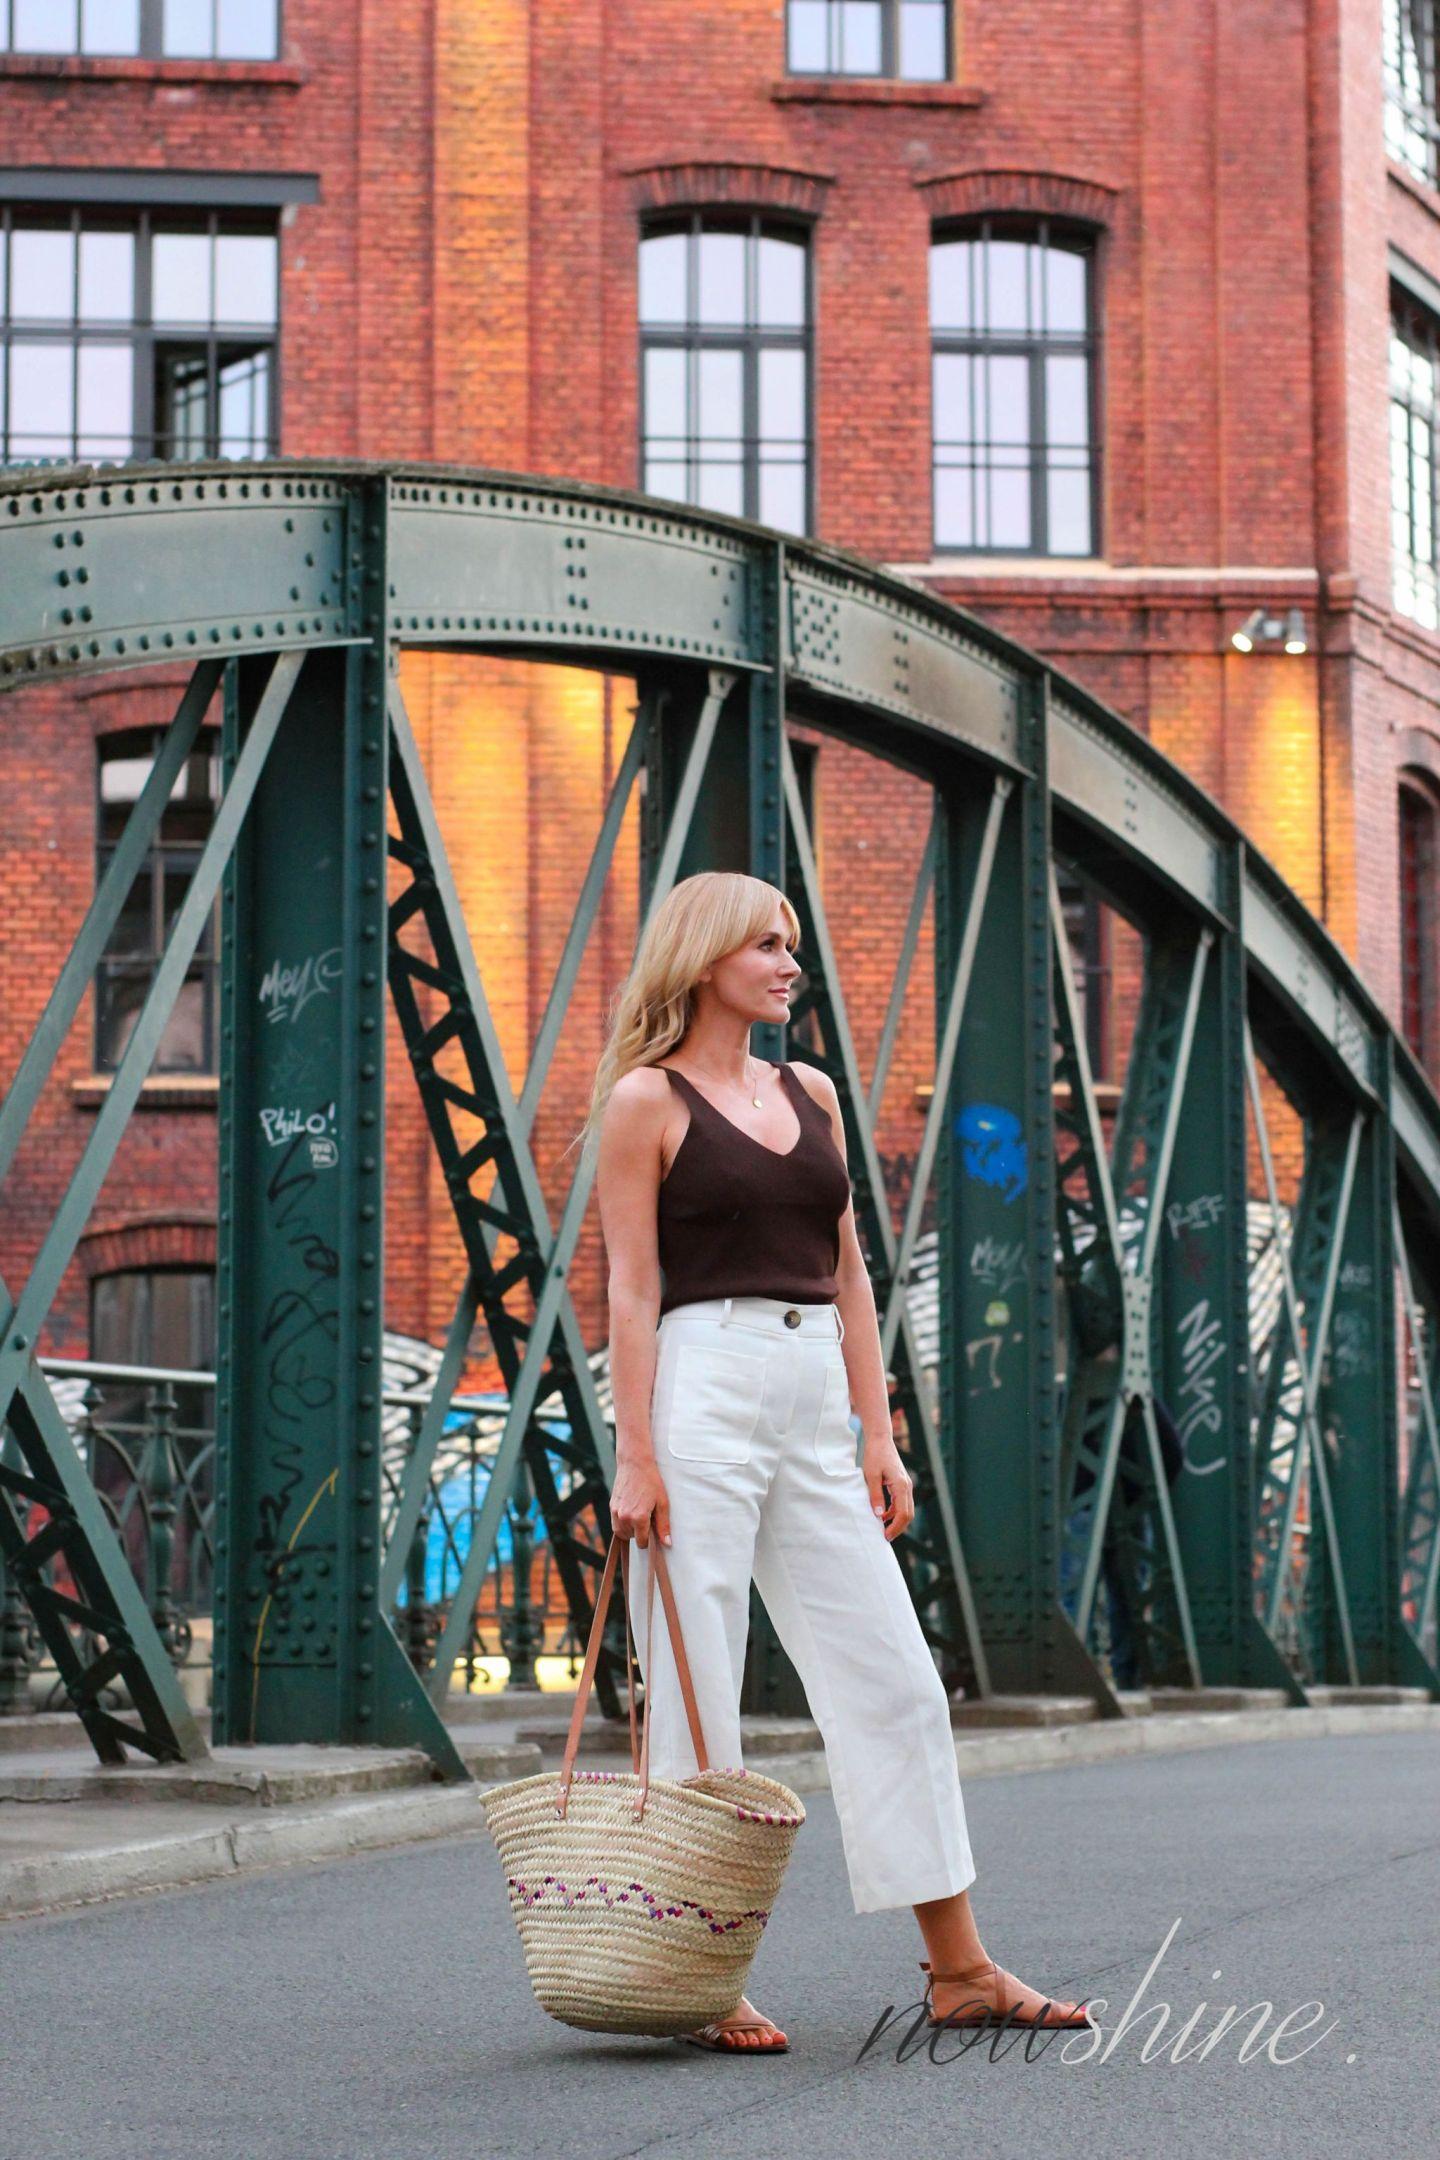 H&M Premium flache Sandalen in Cognac - Nowshine ü40 Fashion Blog